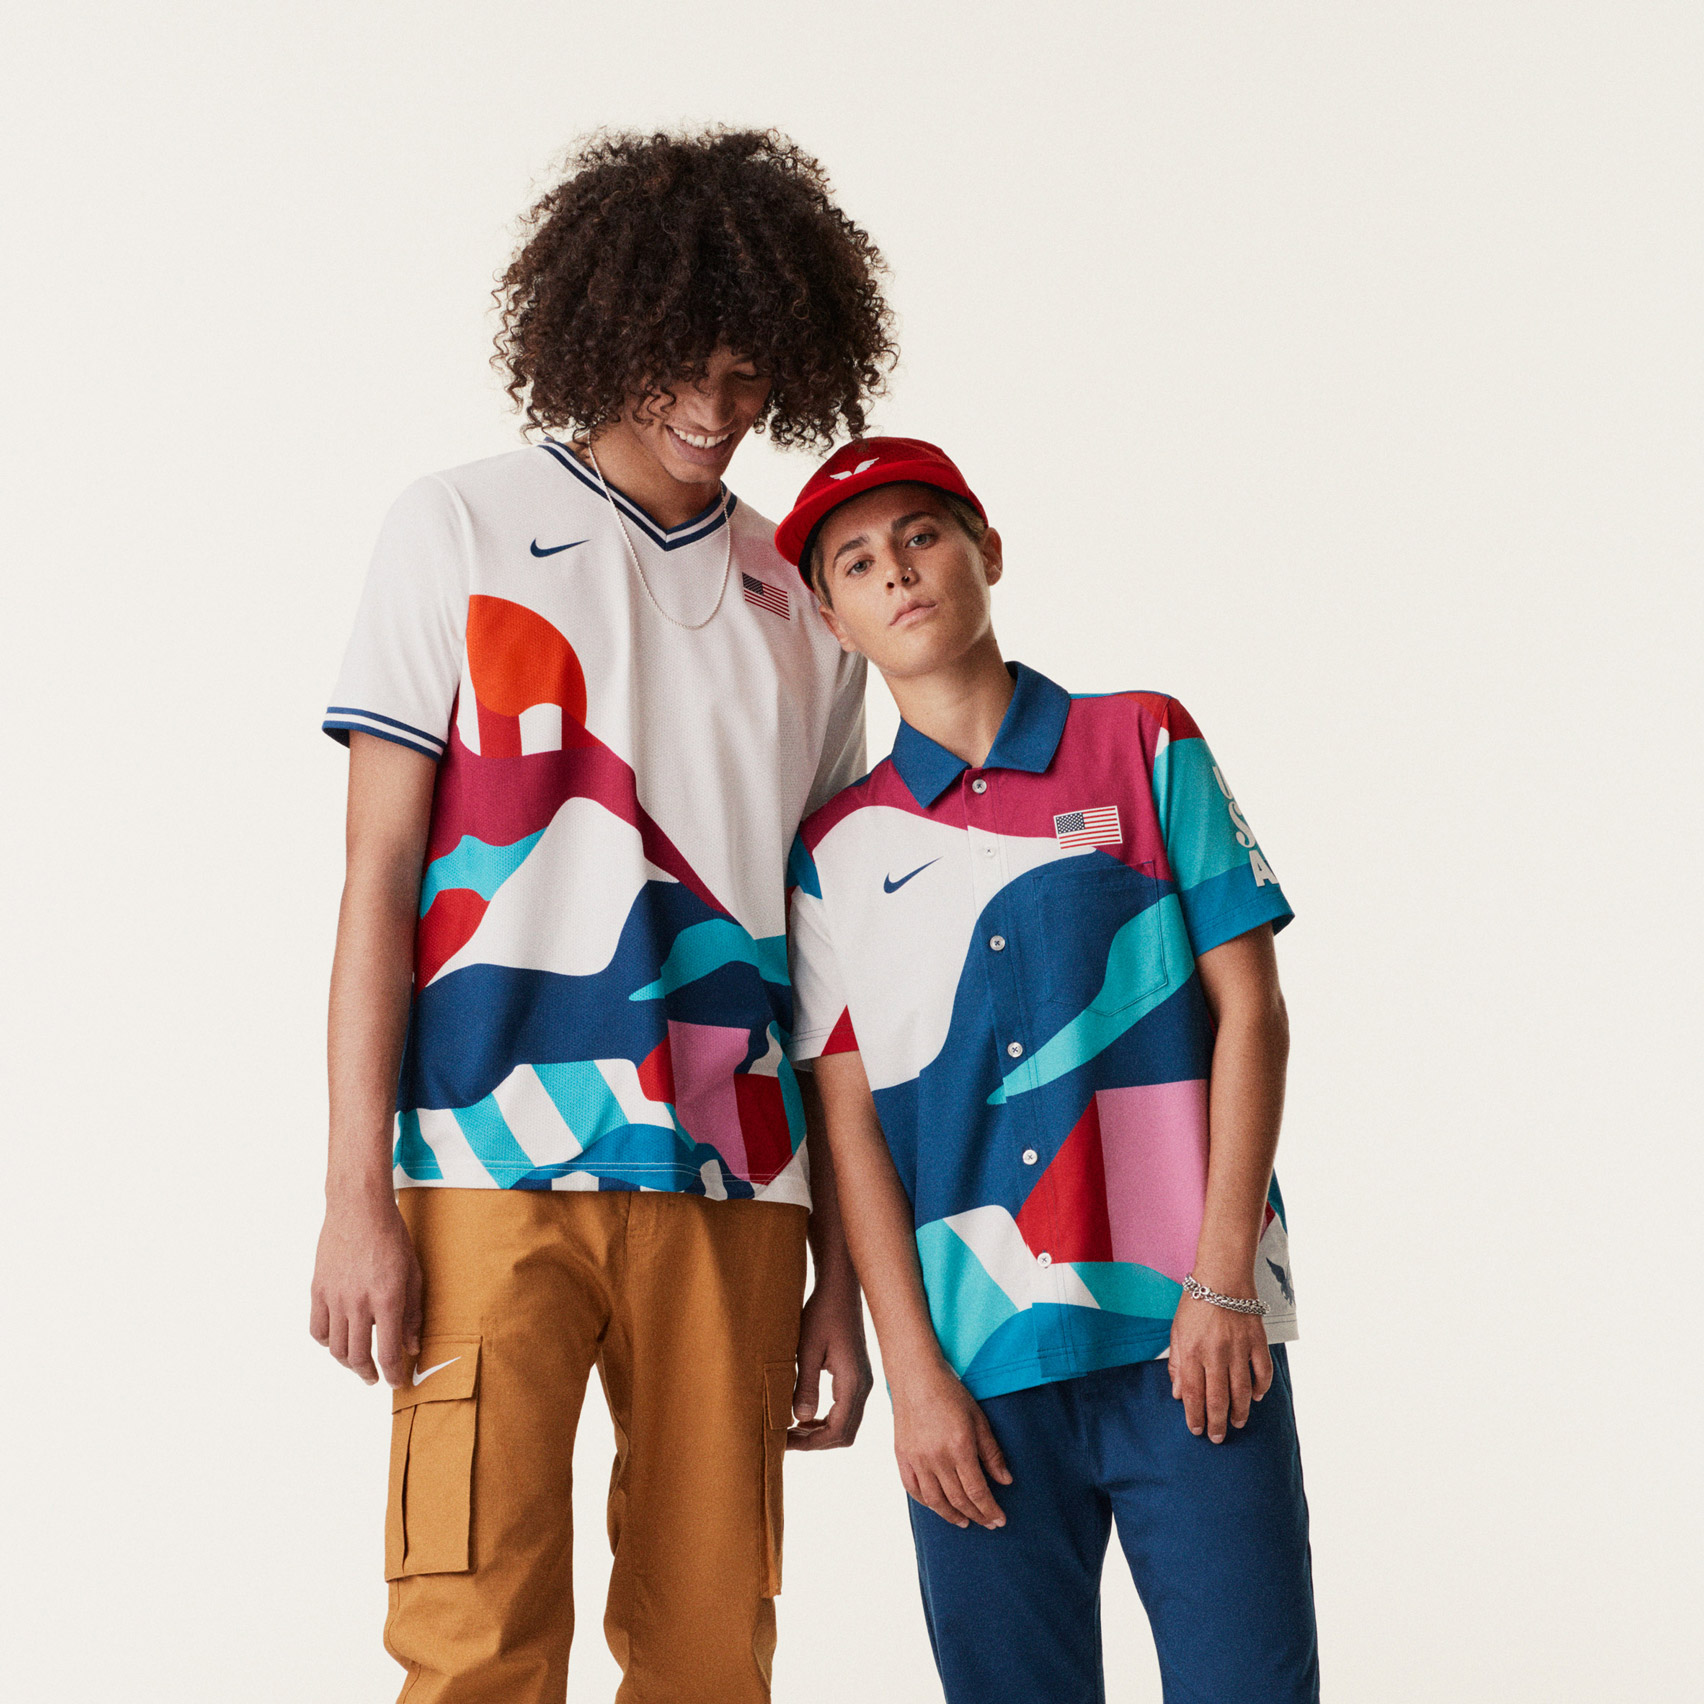 Nike Olympics 2020 Skateboarding Uniform